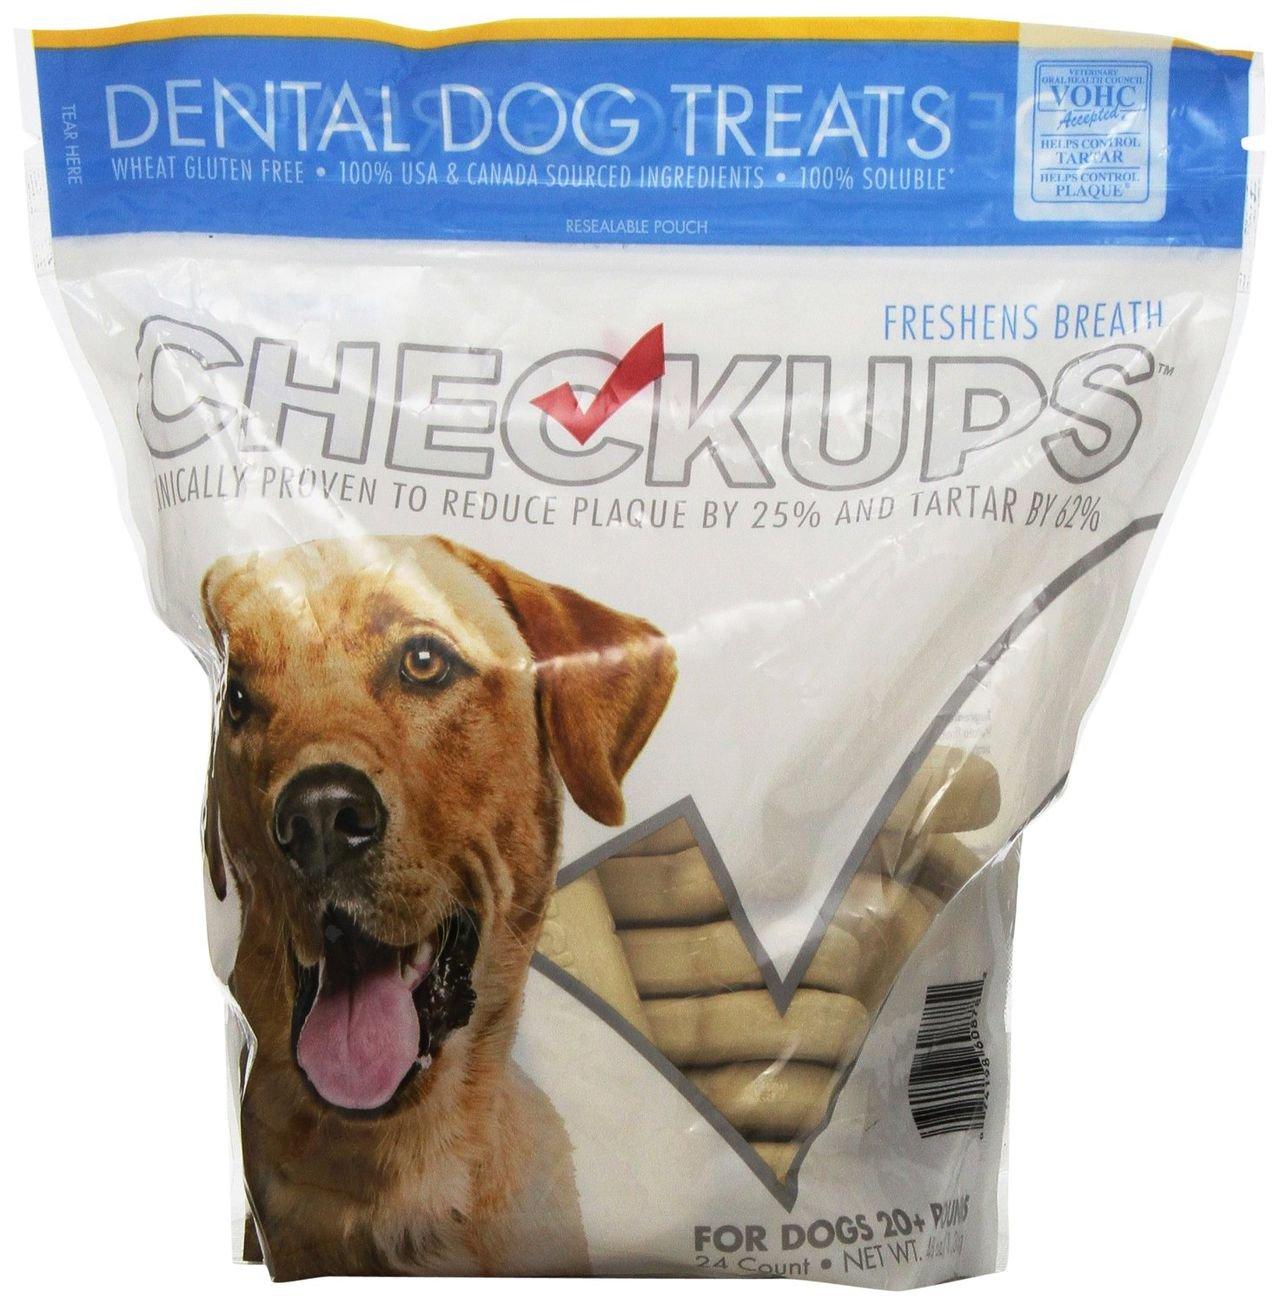 Checkups- Dental Dog Treats, 24ct 48 oz. for Dogs Pack of 2 fj